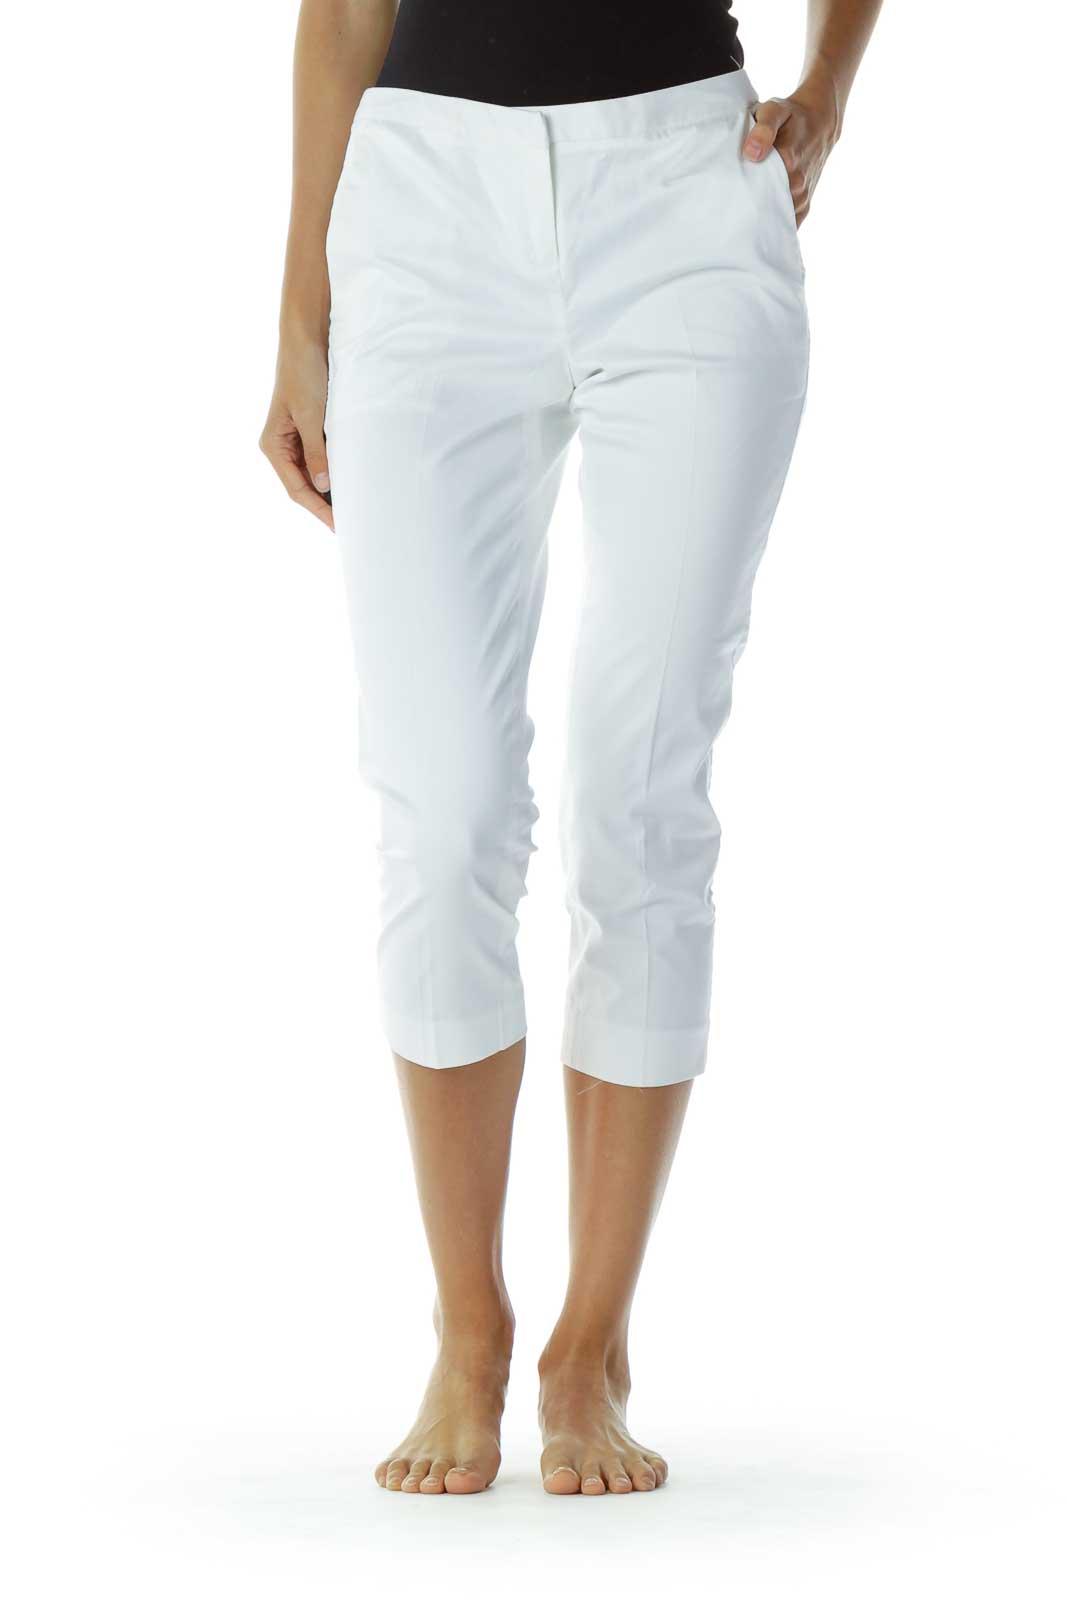 White Cropped Slacks